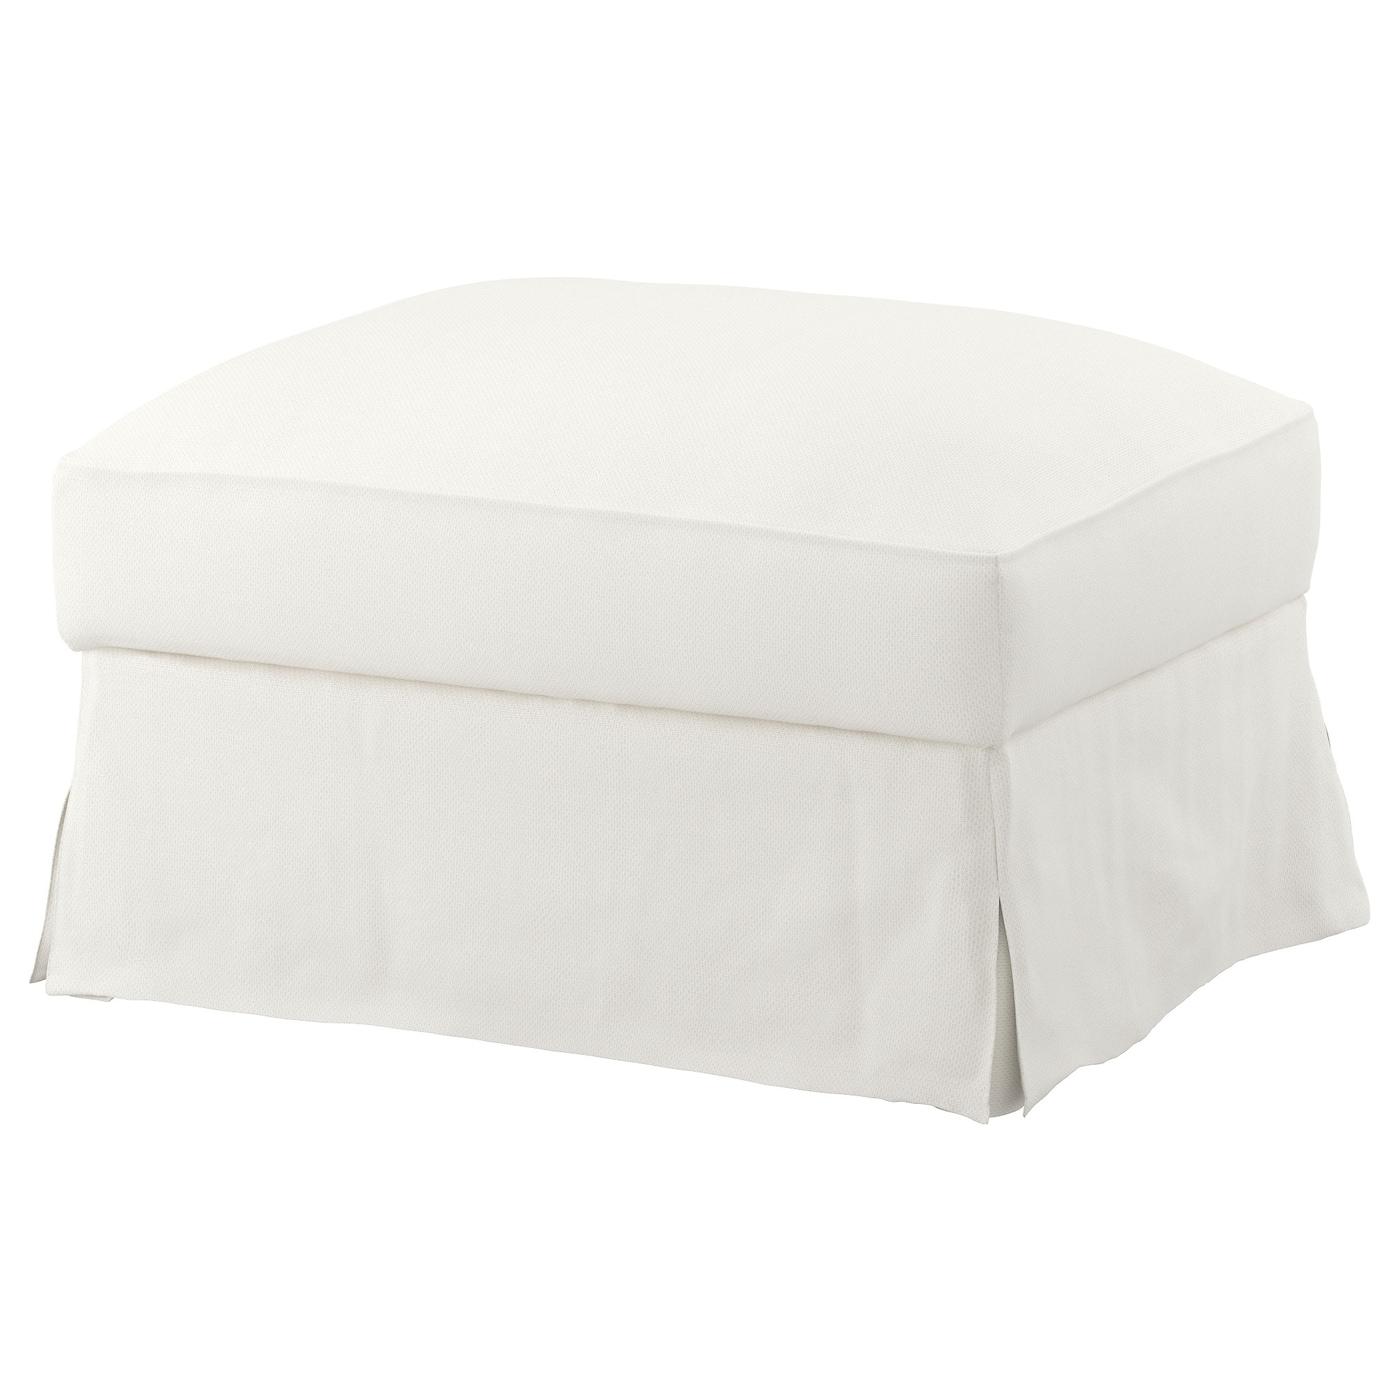 f rl v repose pieds av rangement flodafors blanc ikea. Black Bedroom Furniture Sets. Home Design Ideas